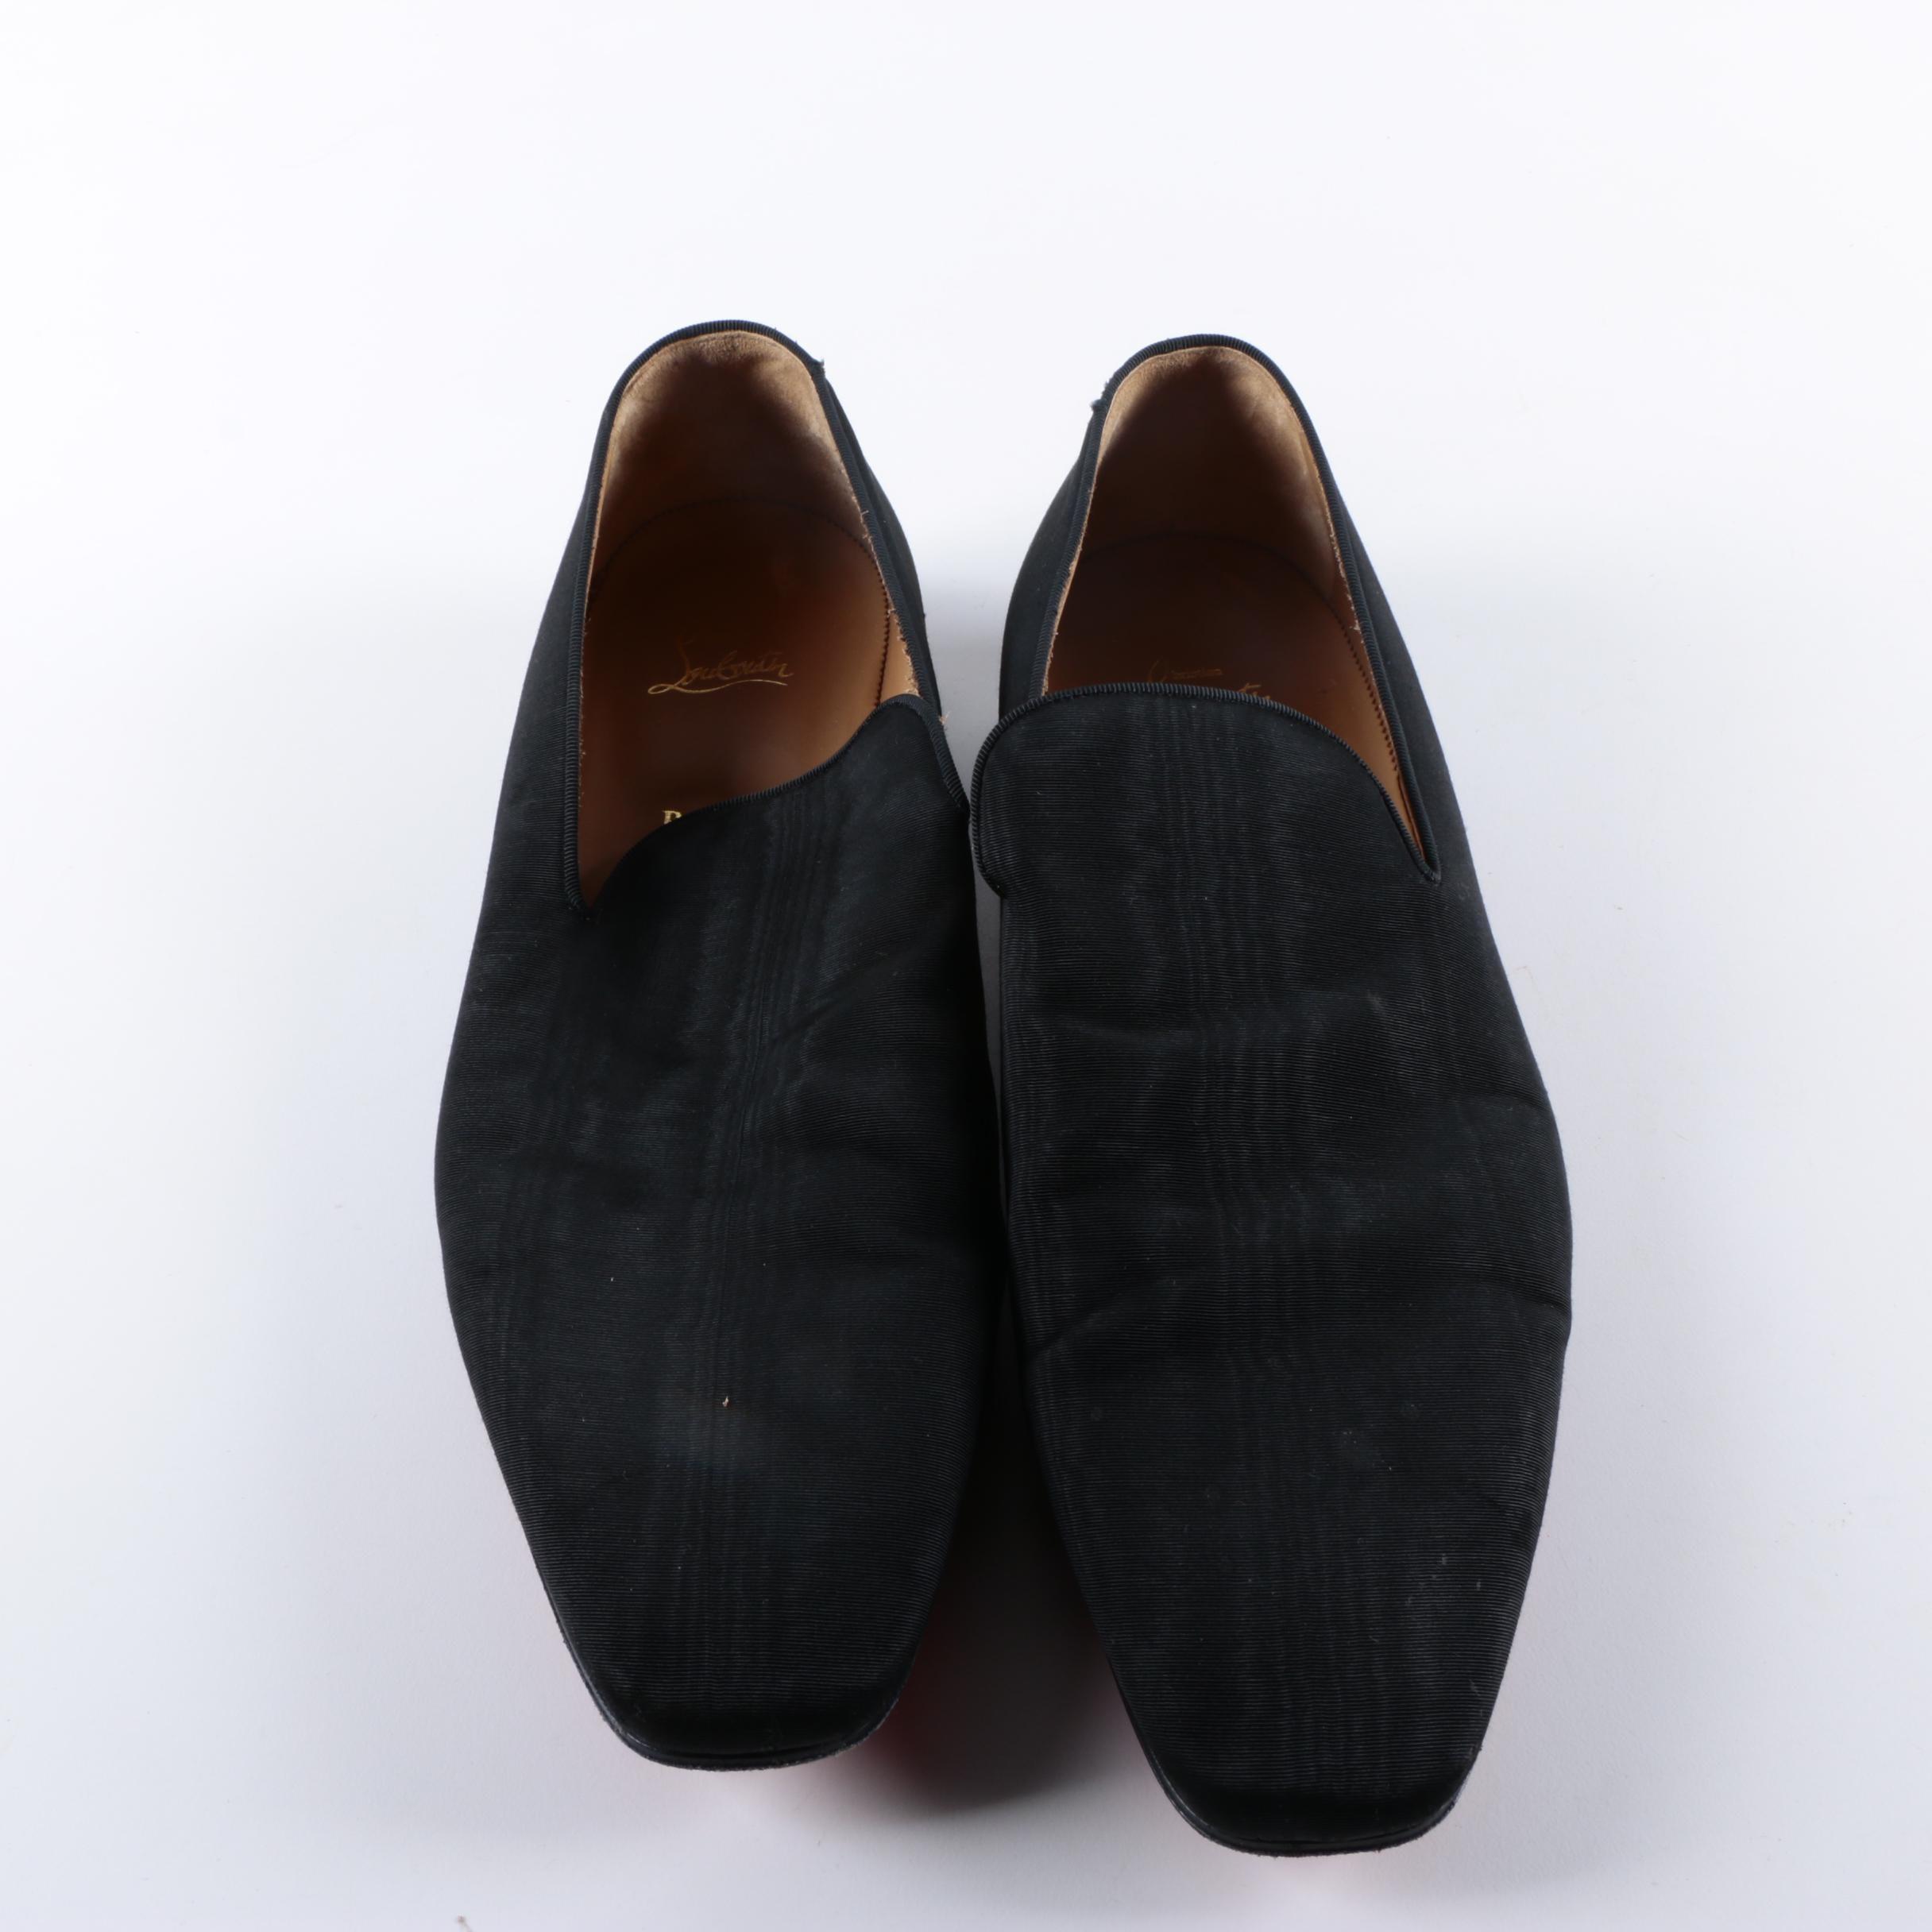 Men's Christian Louboutin Dandelion Black Moire Loafers